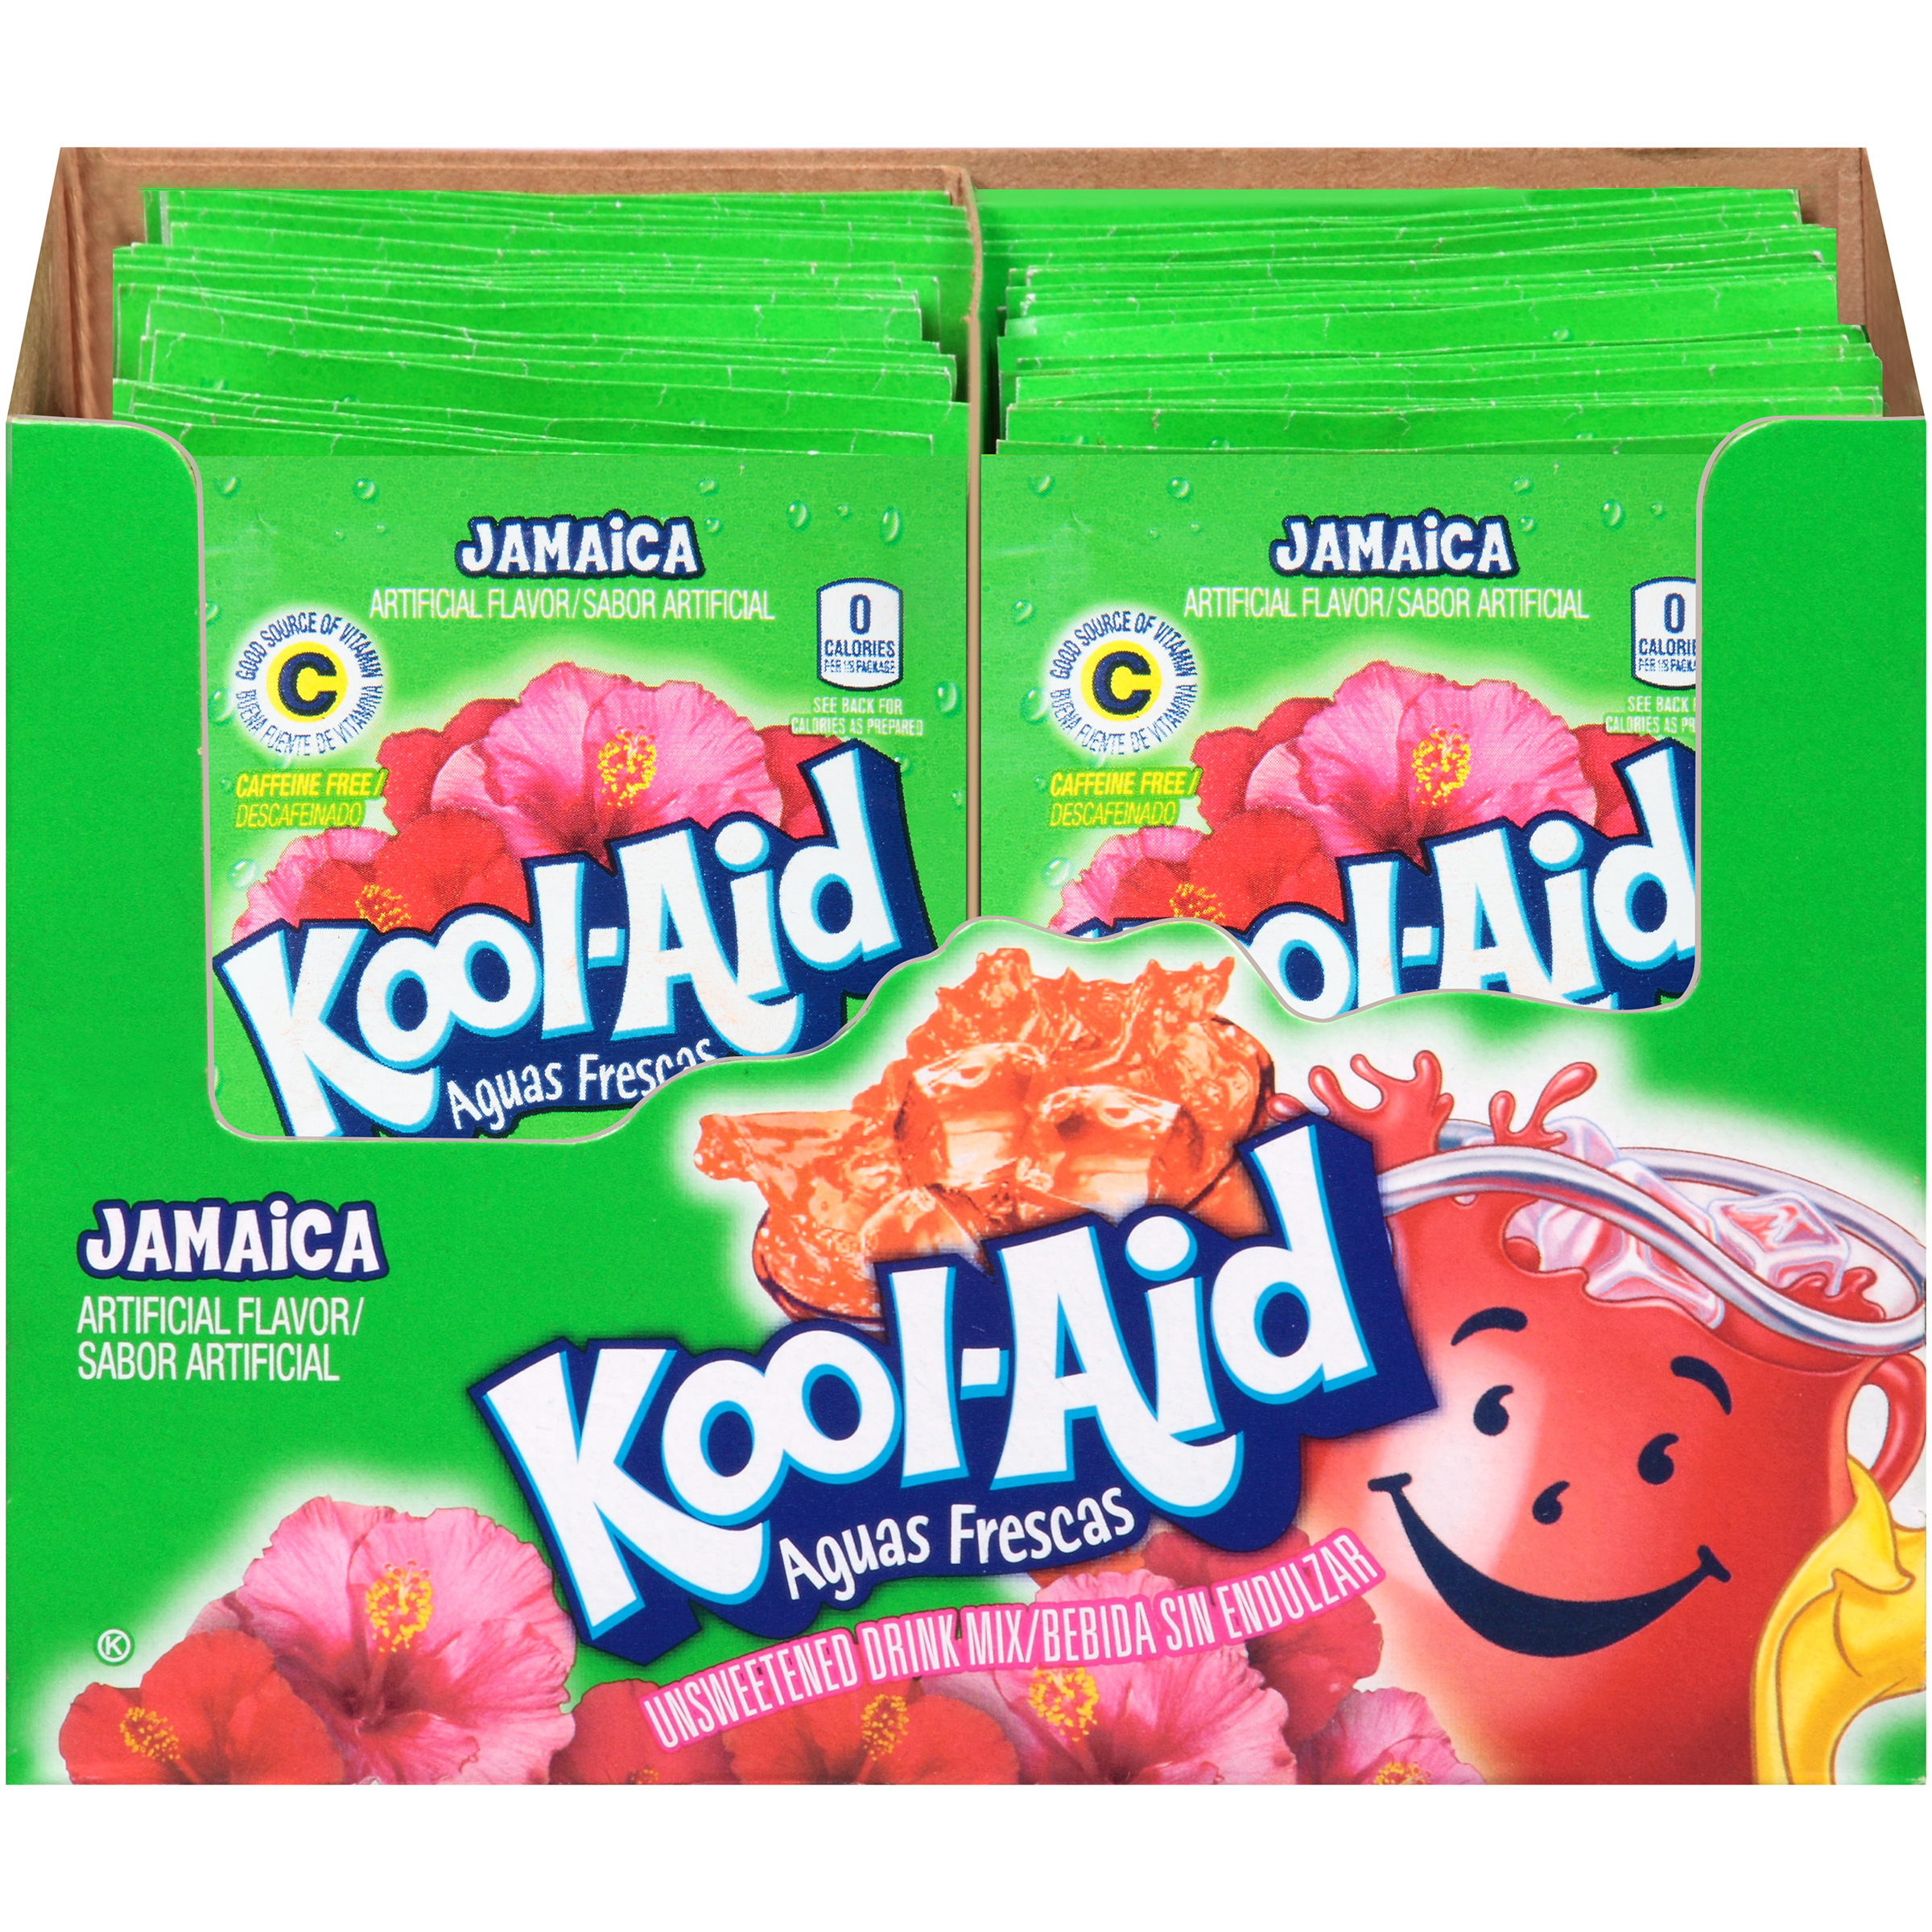 KOOL-AID Aguas Frescas Jamaica Drink Mix Unsweetened  0.14 oz Packet image